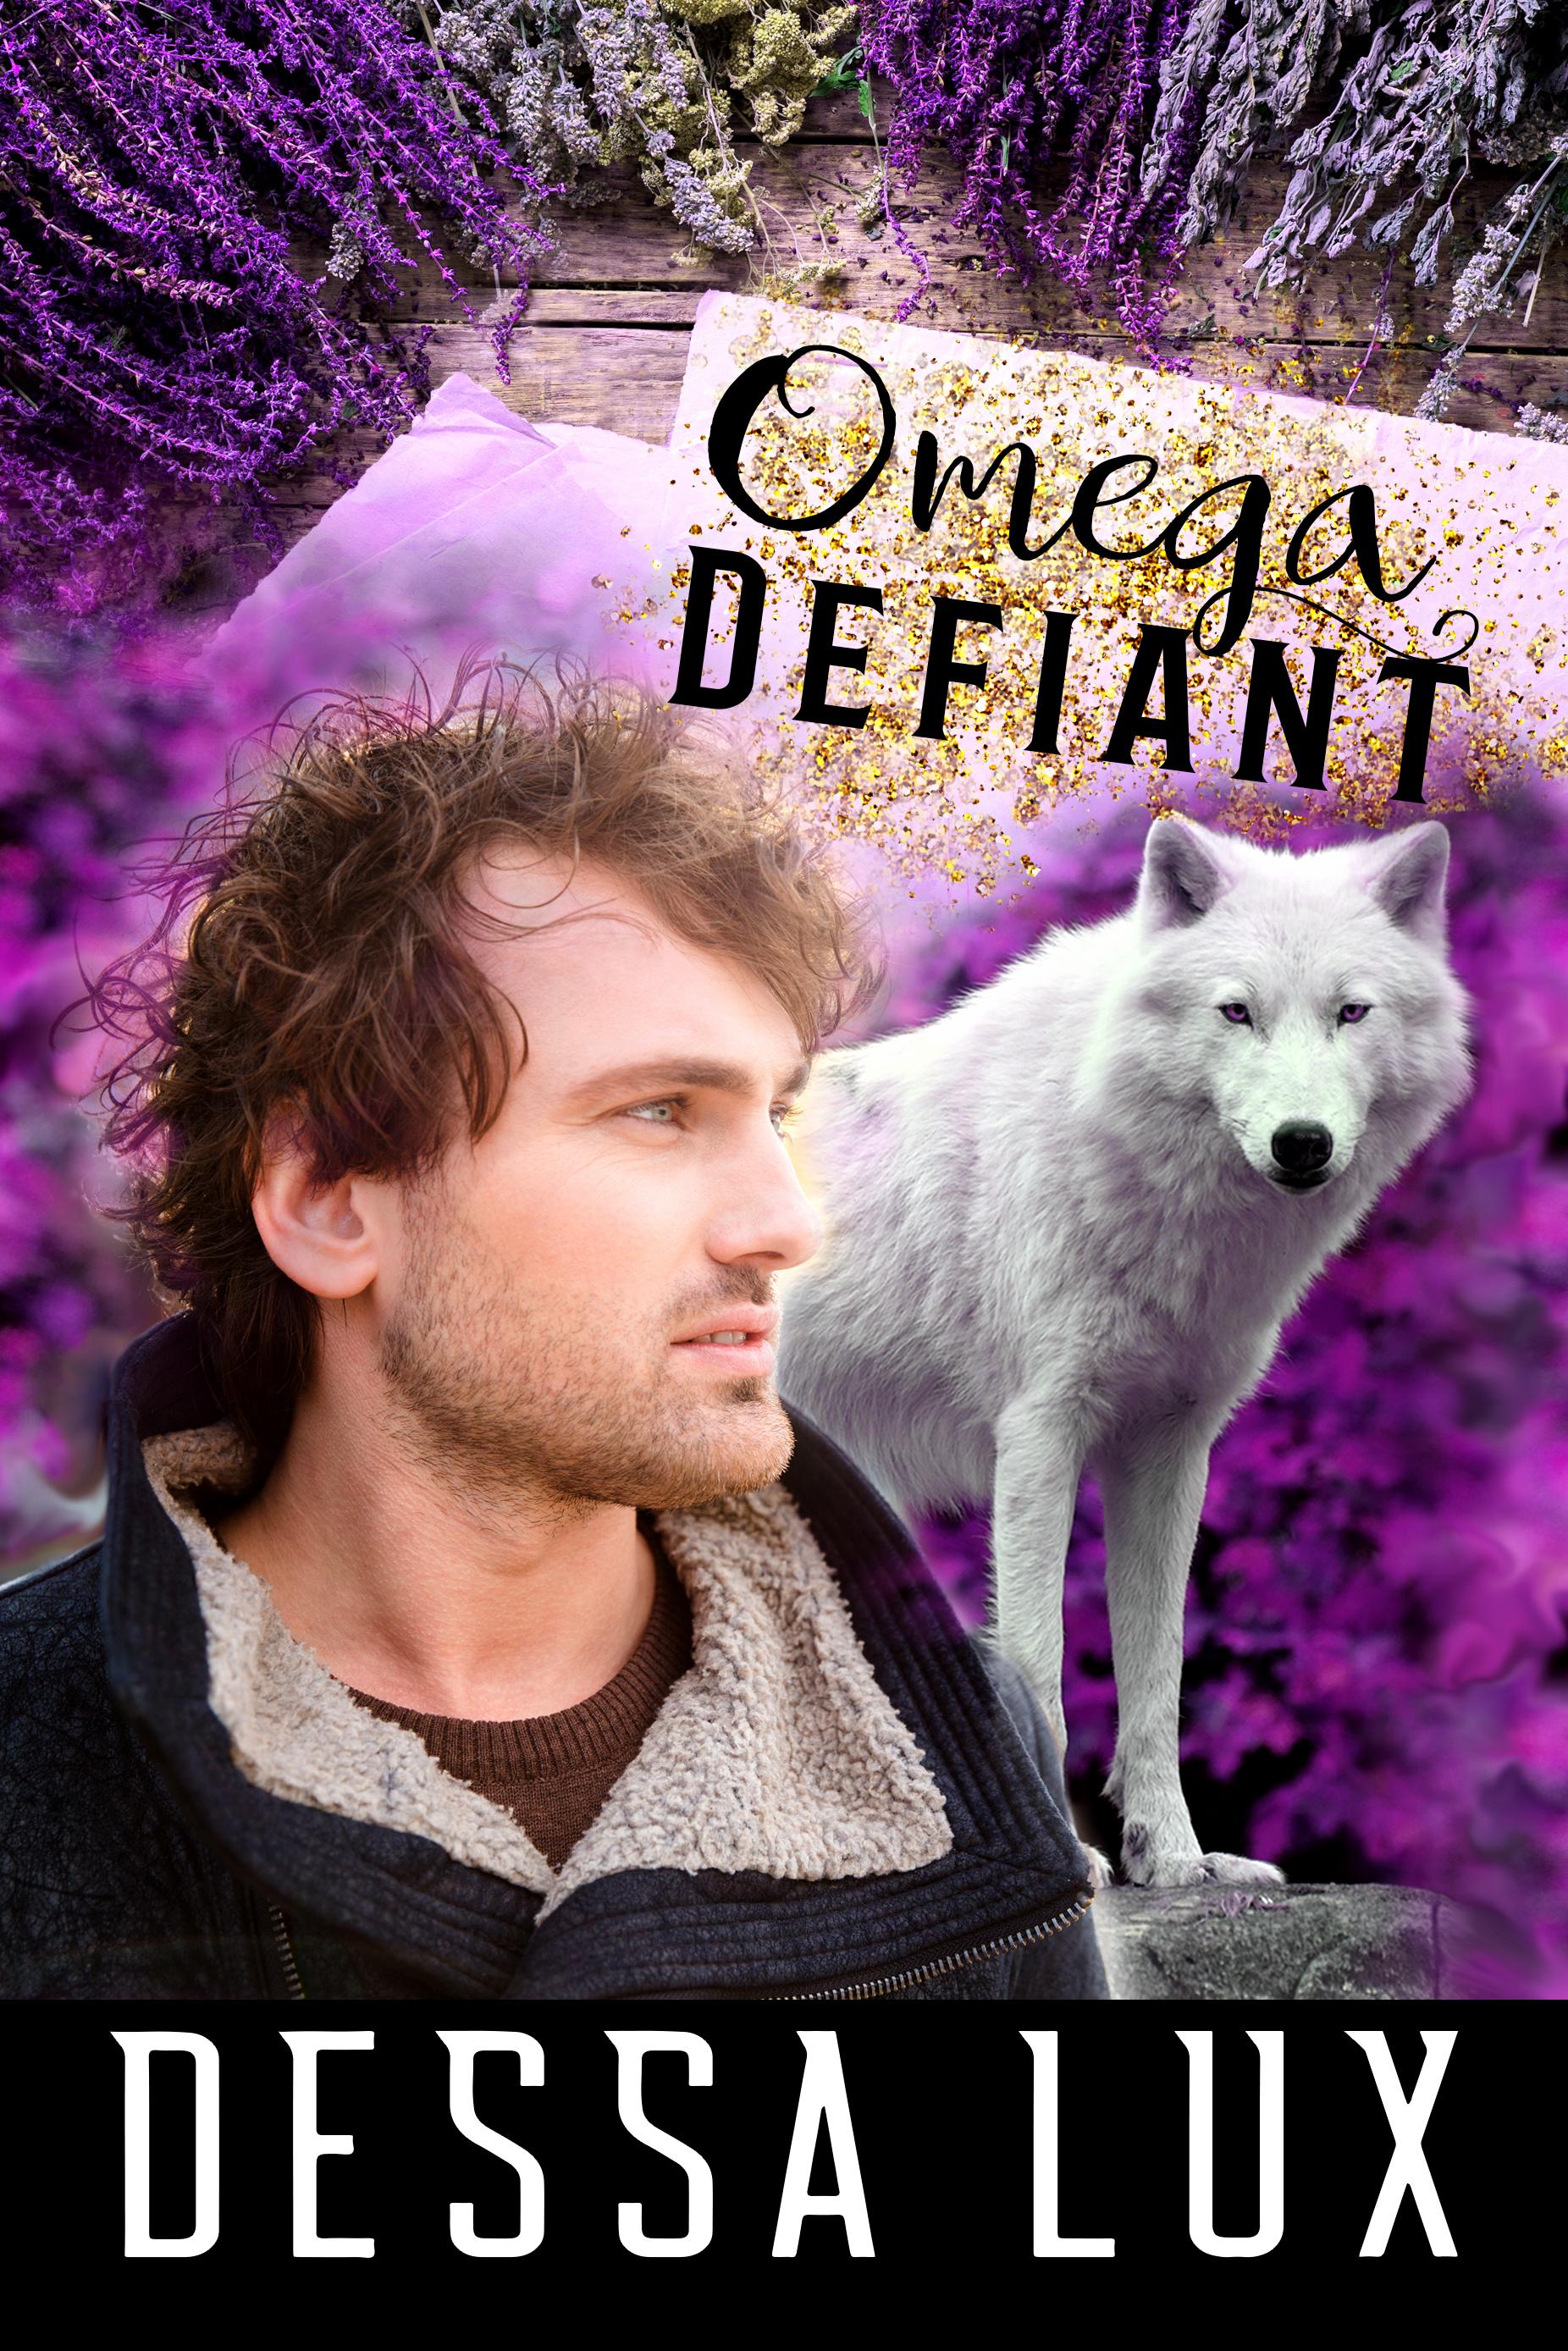 omega defiant final cover image